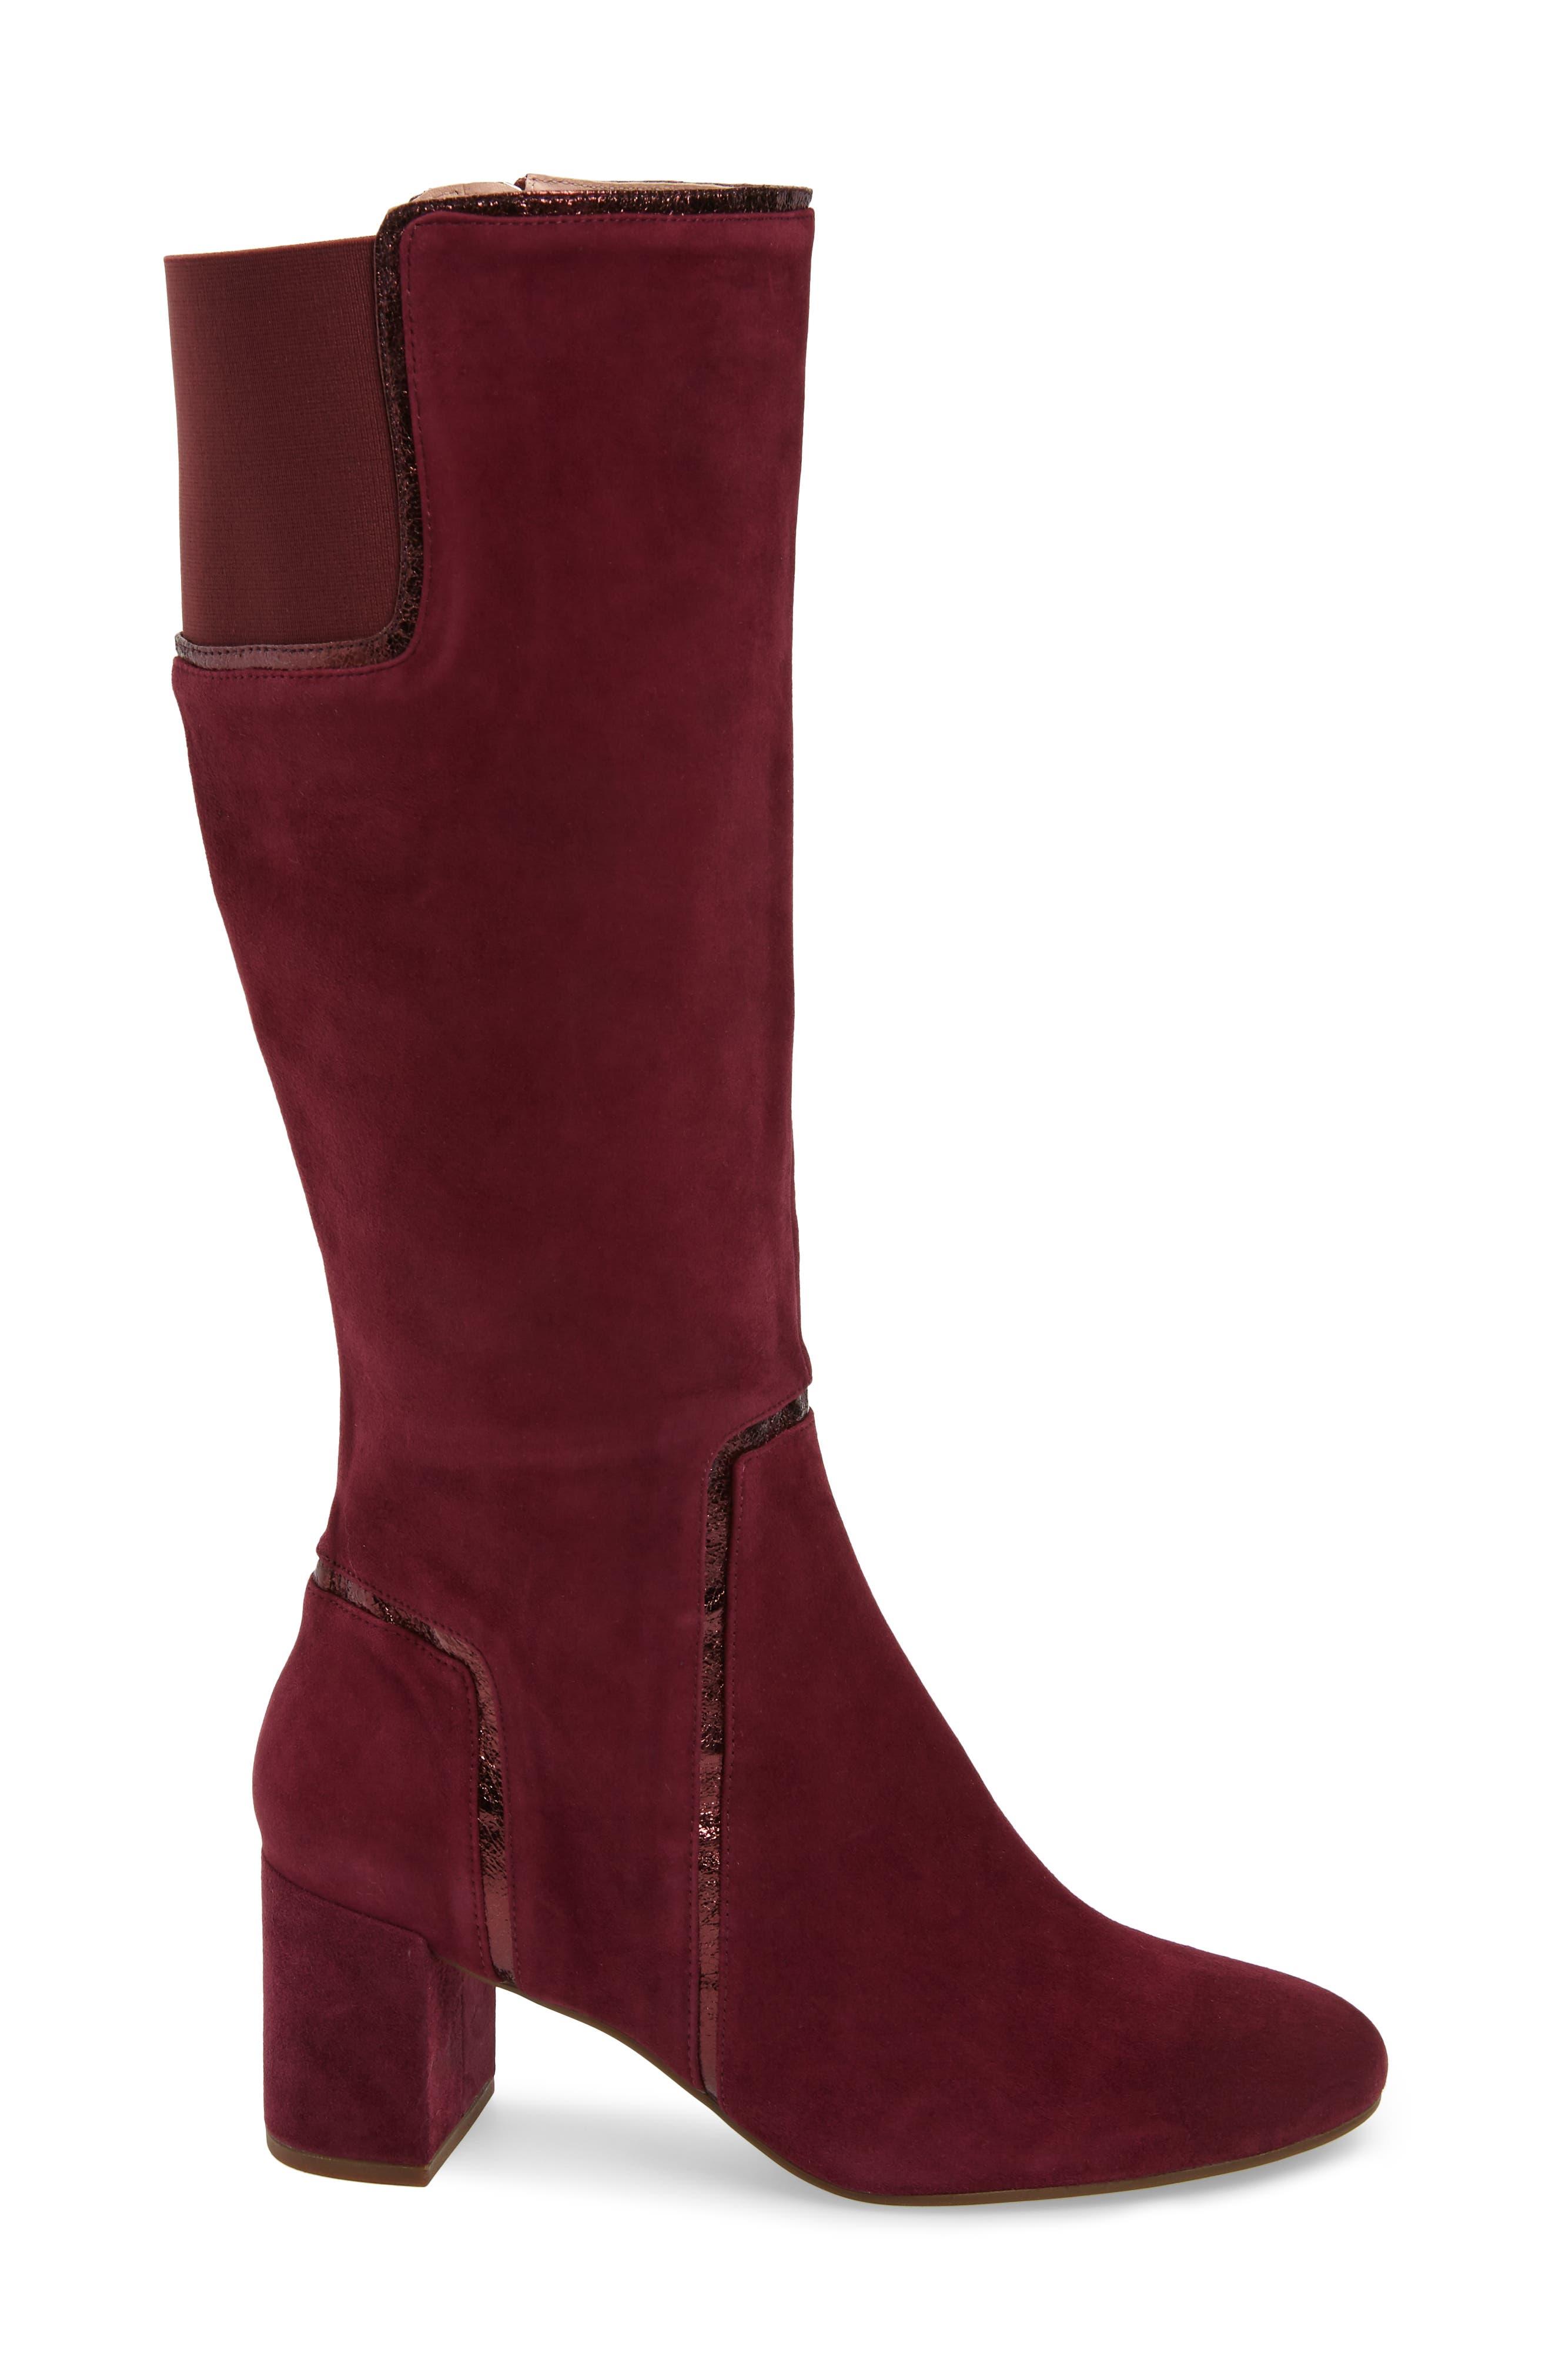 TARYN ROSE, Charlee Knee High Boot, Alternate thumbnail 3, color, FIG SUEDE